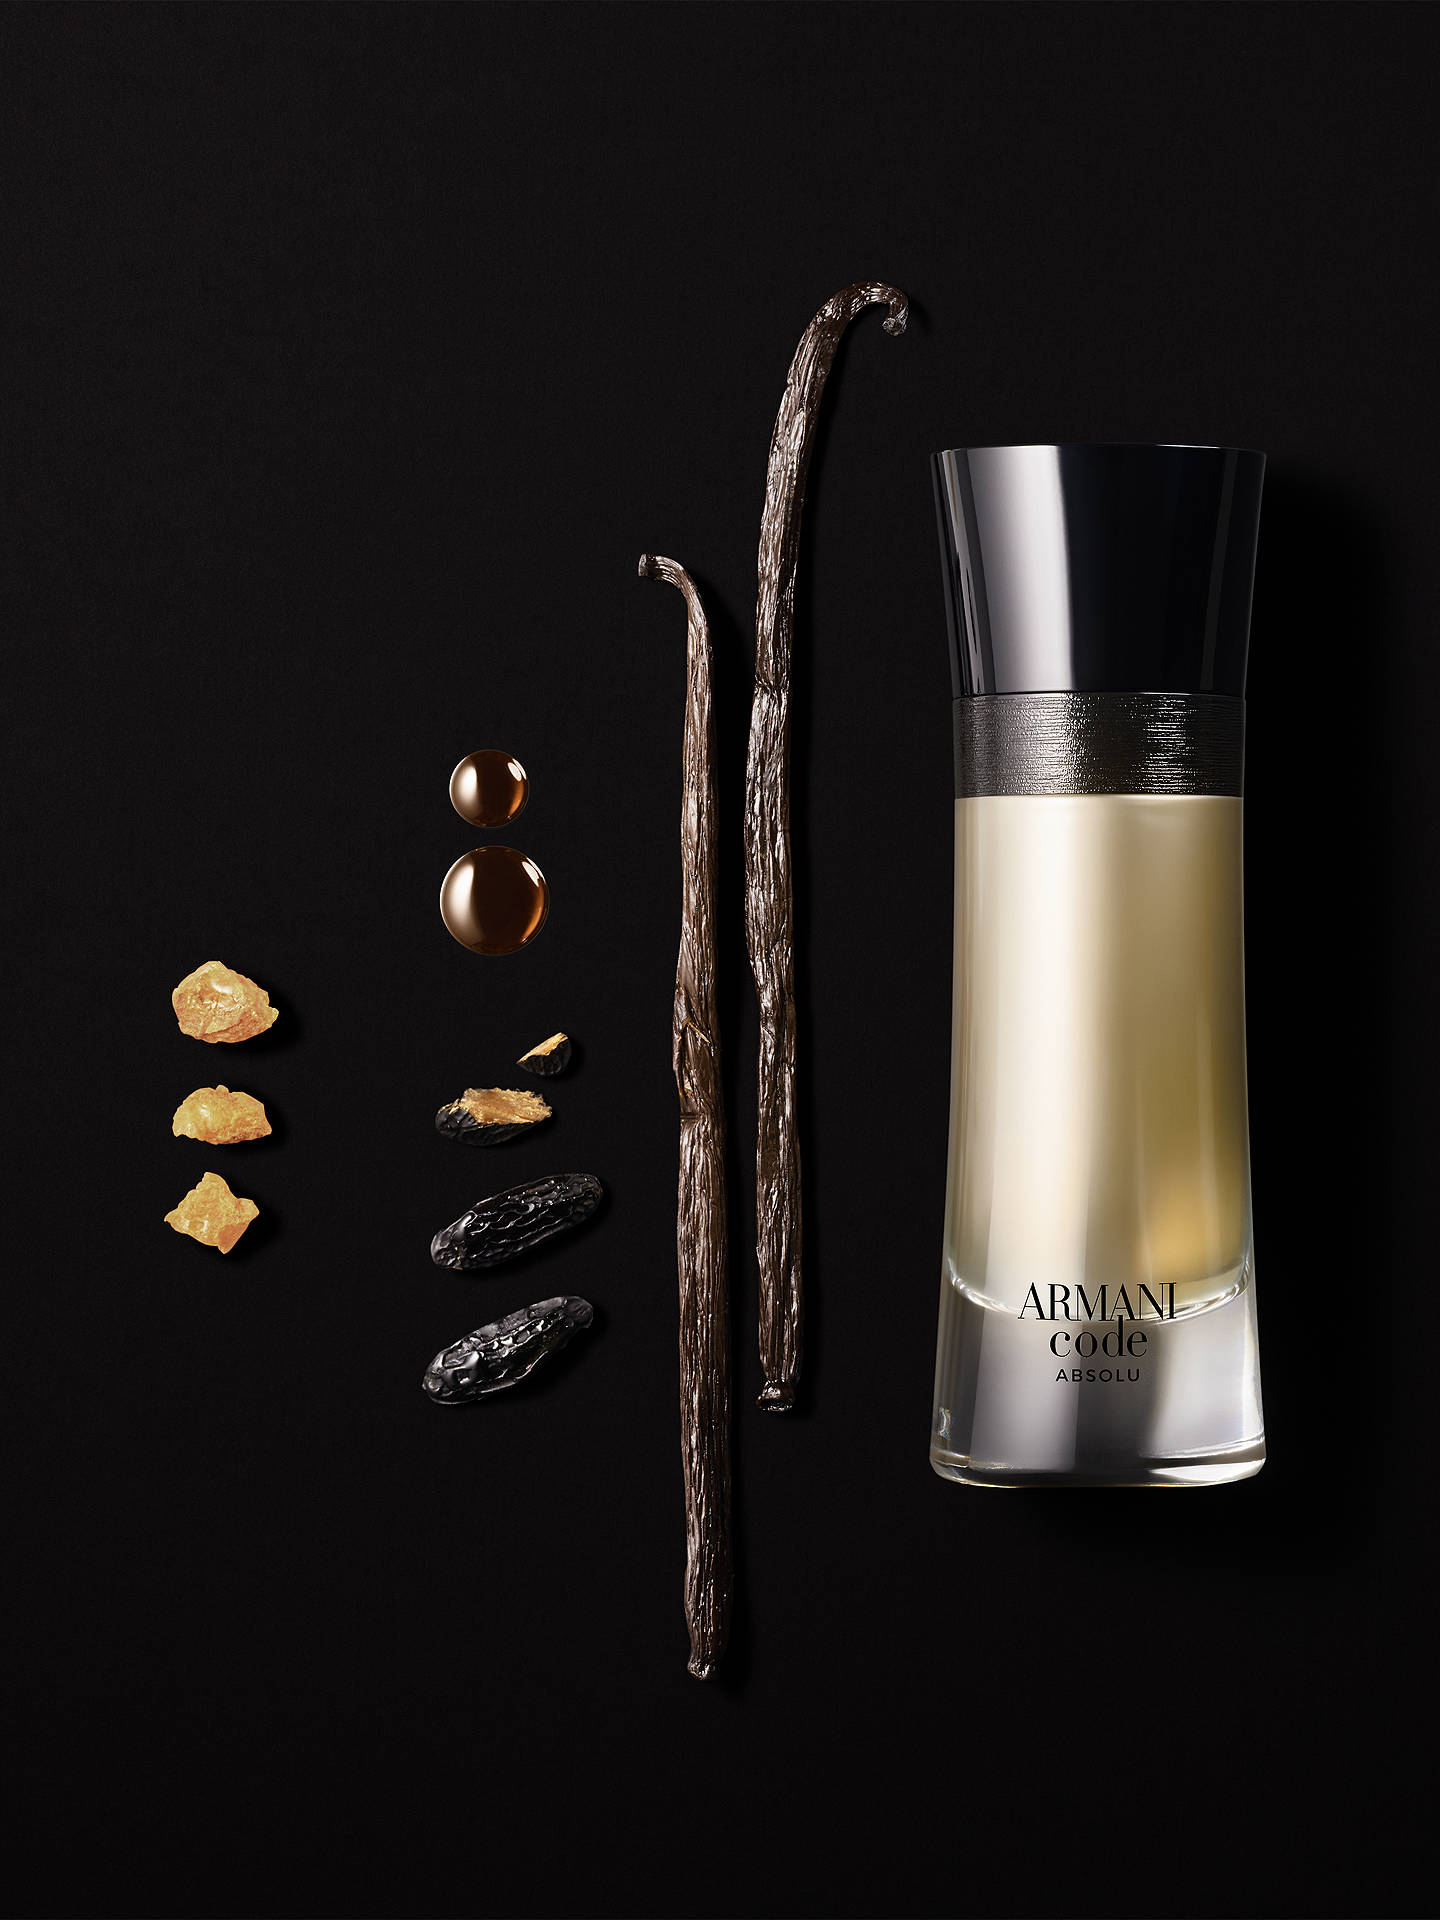 4eecd7280c09b2 Buy Giorgio Armani Code Absolu Eau de Parfum For Men, 30ml Online at  johnlewis.